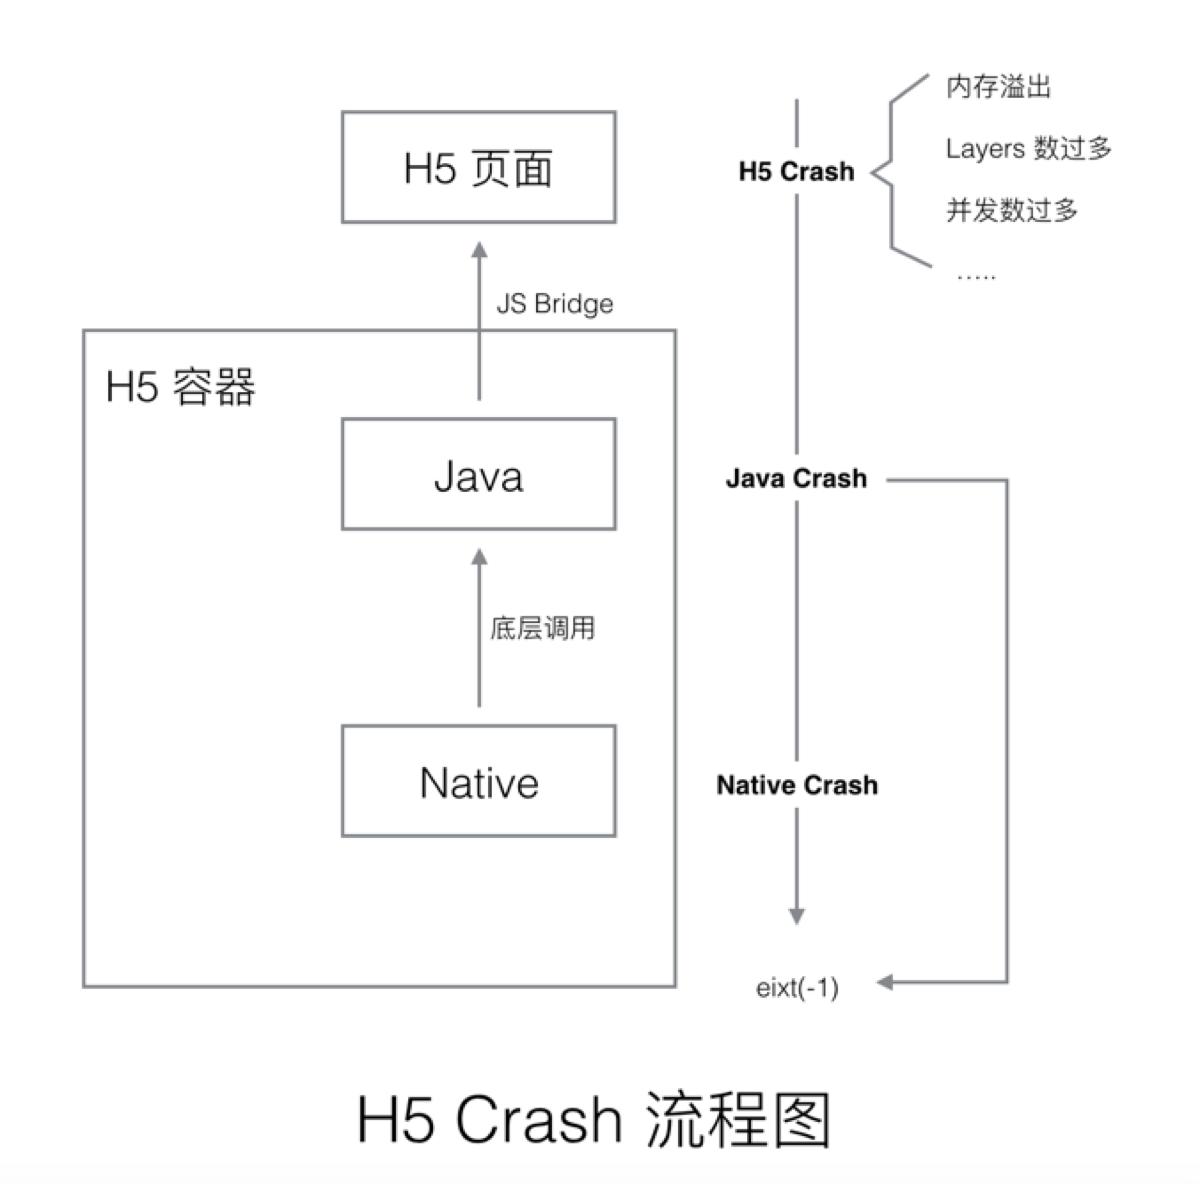 H5 Crash 流程图